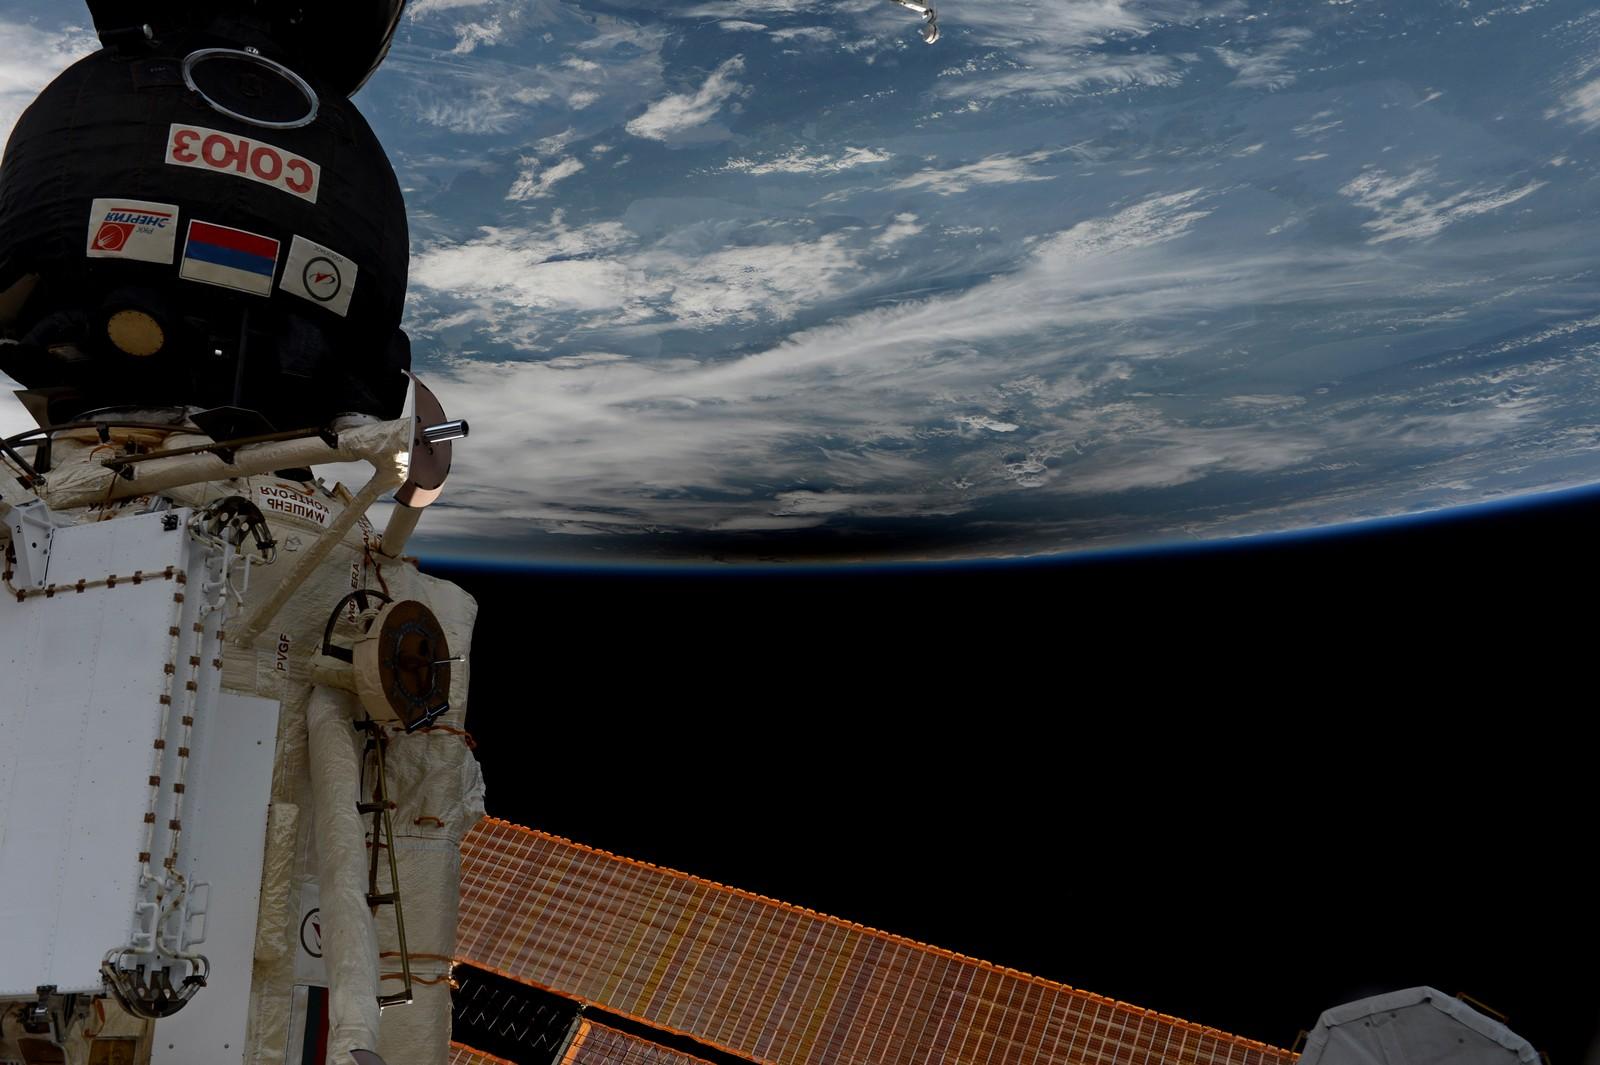 2017 international space station - photo #32